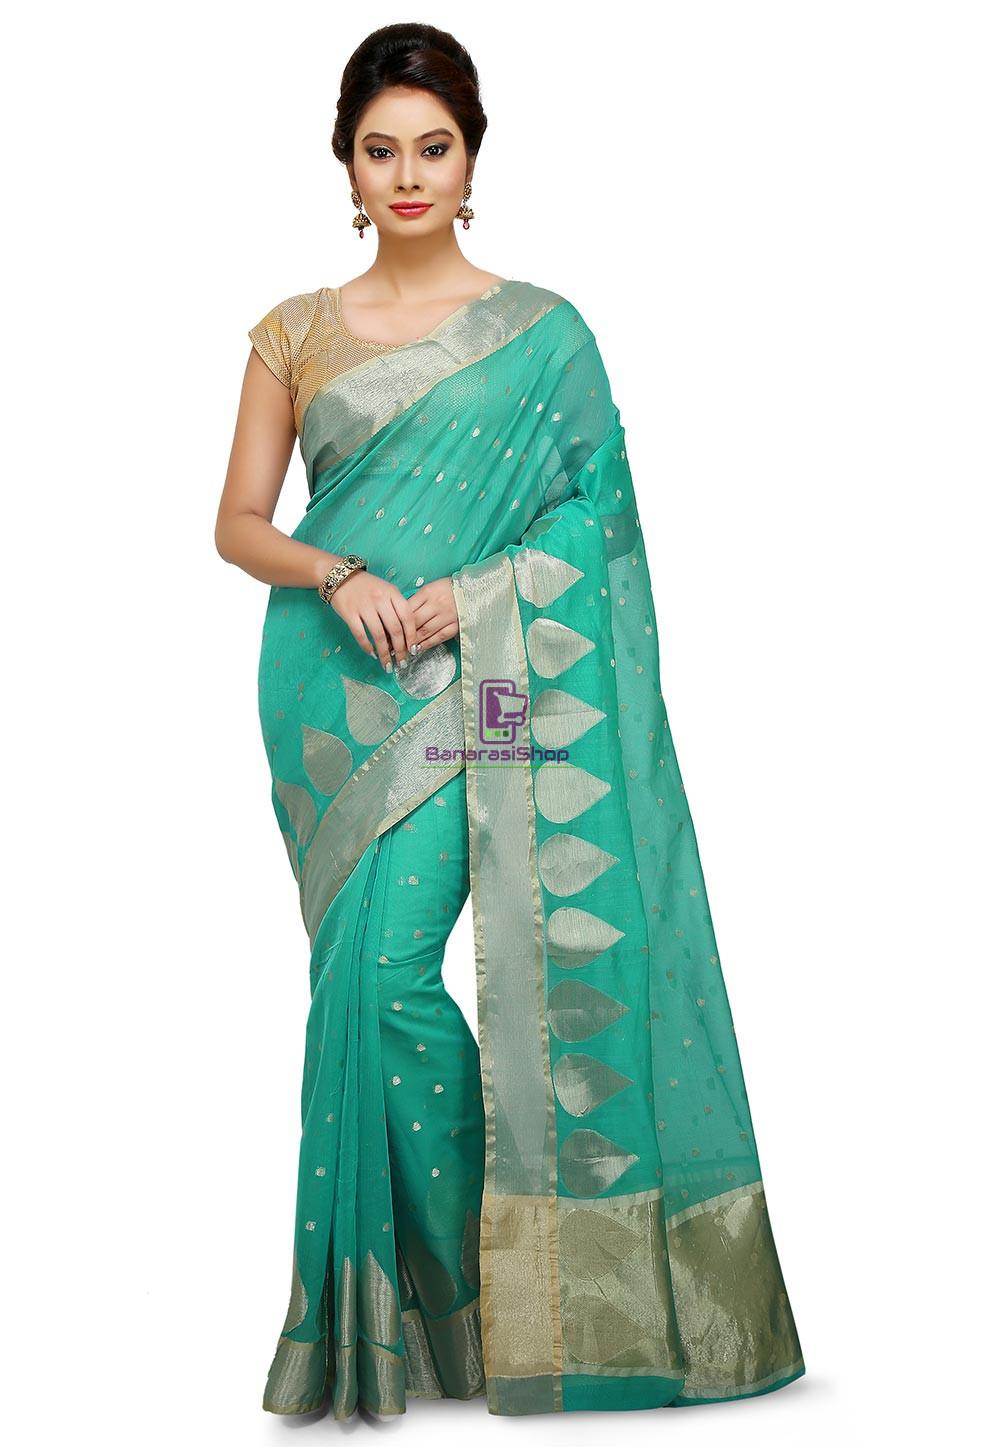 Woven Banarasi Cotton Silk Saree in Teal Green 1